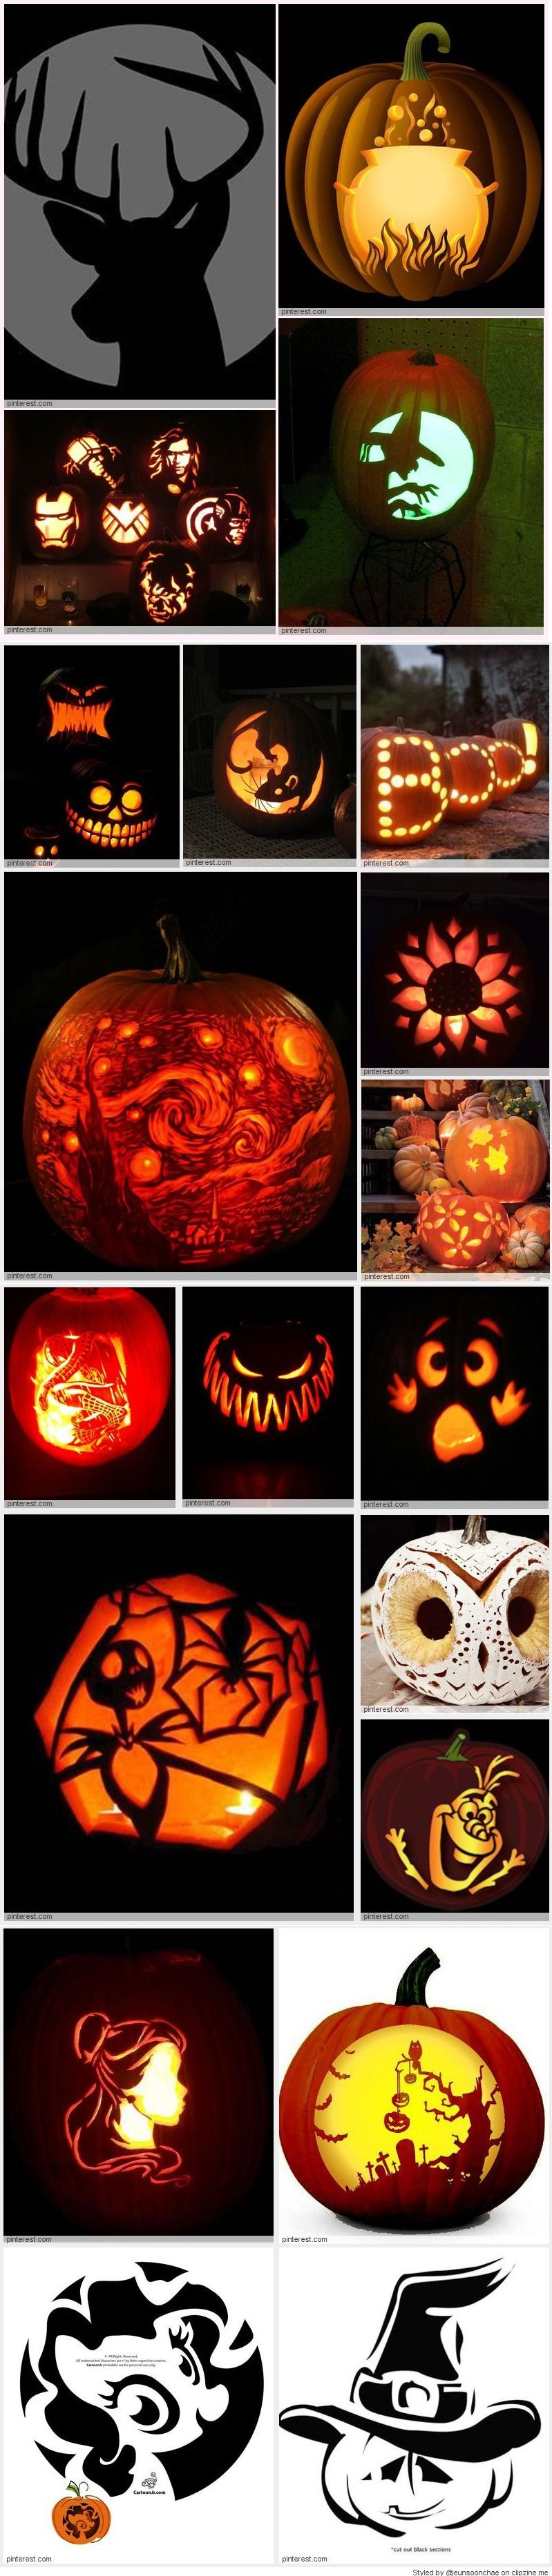 Fabulous Fall Decorating Ideas | Votive holder and Pumpkin ideas